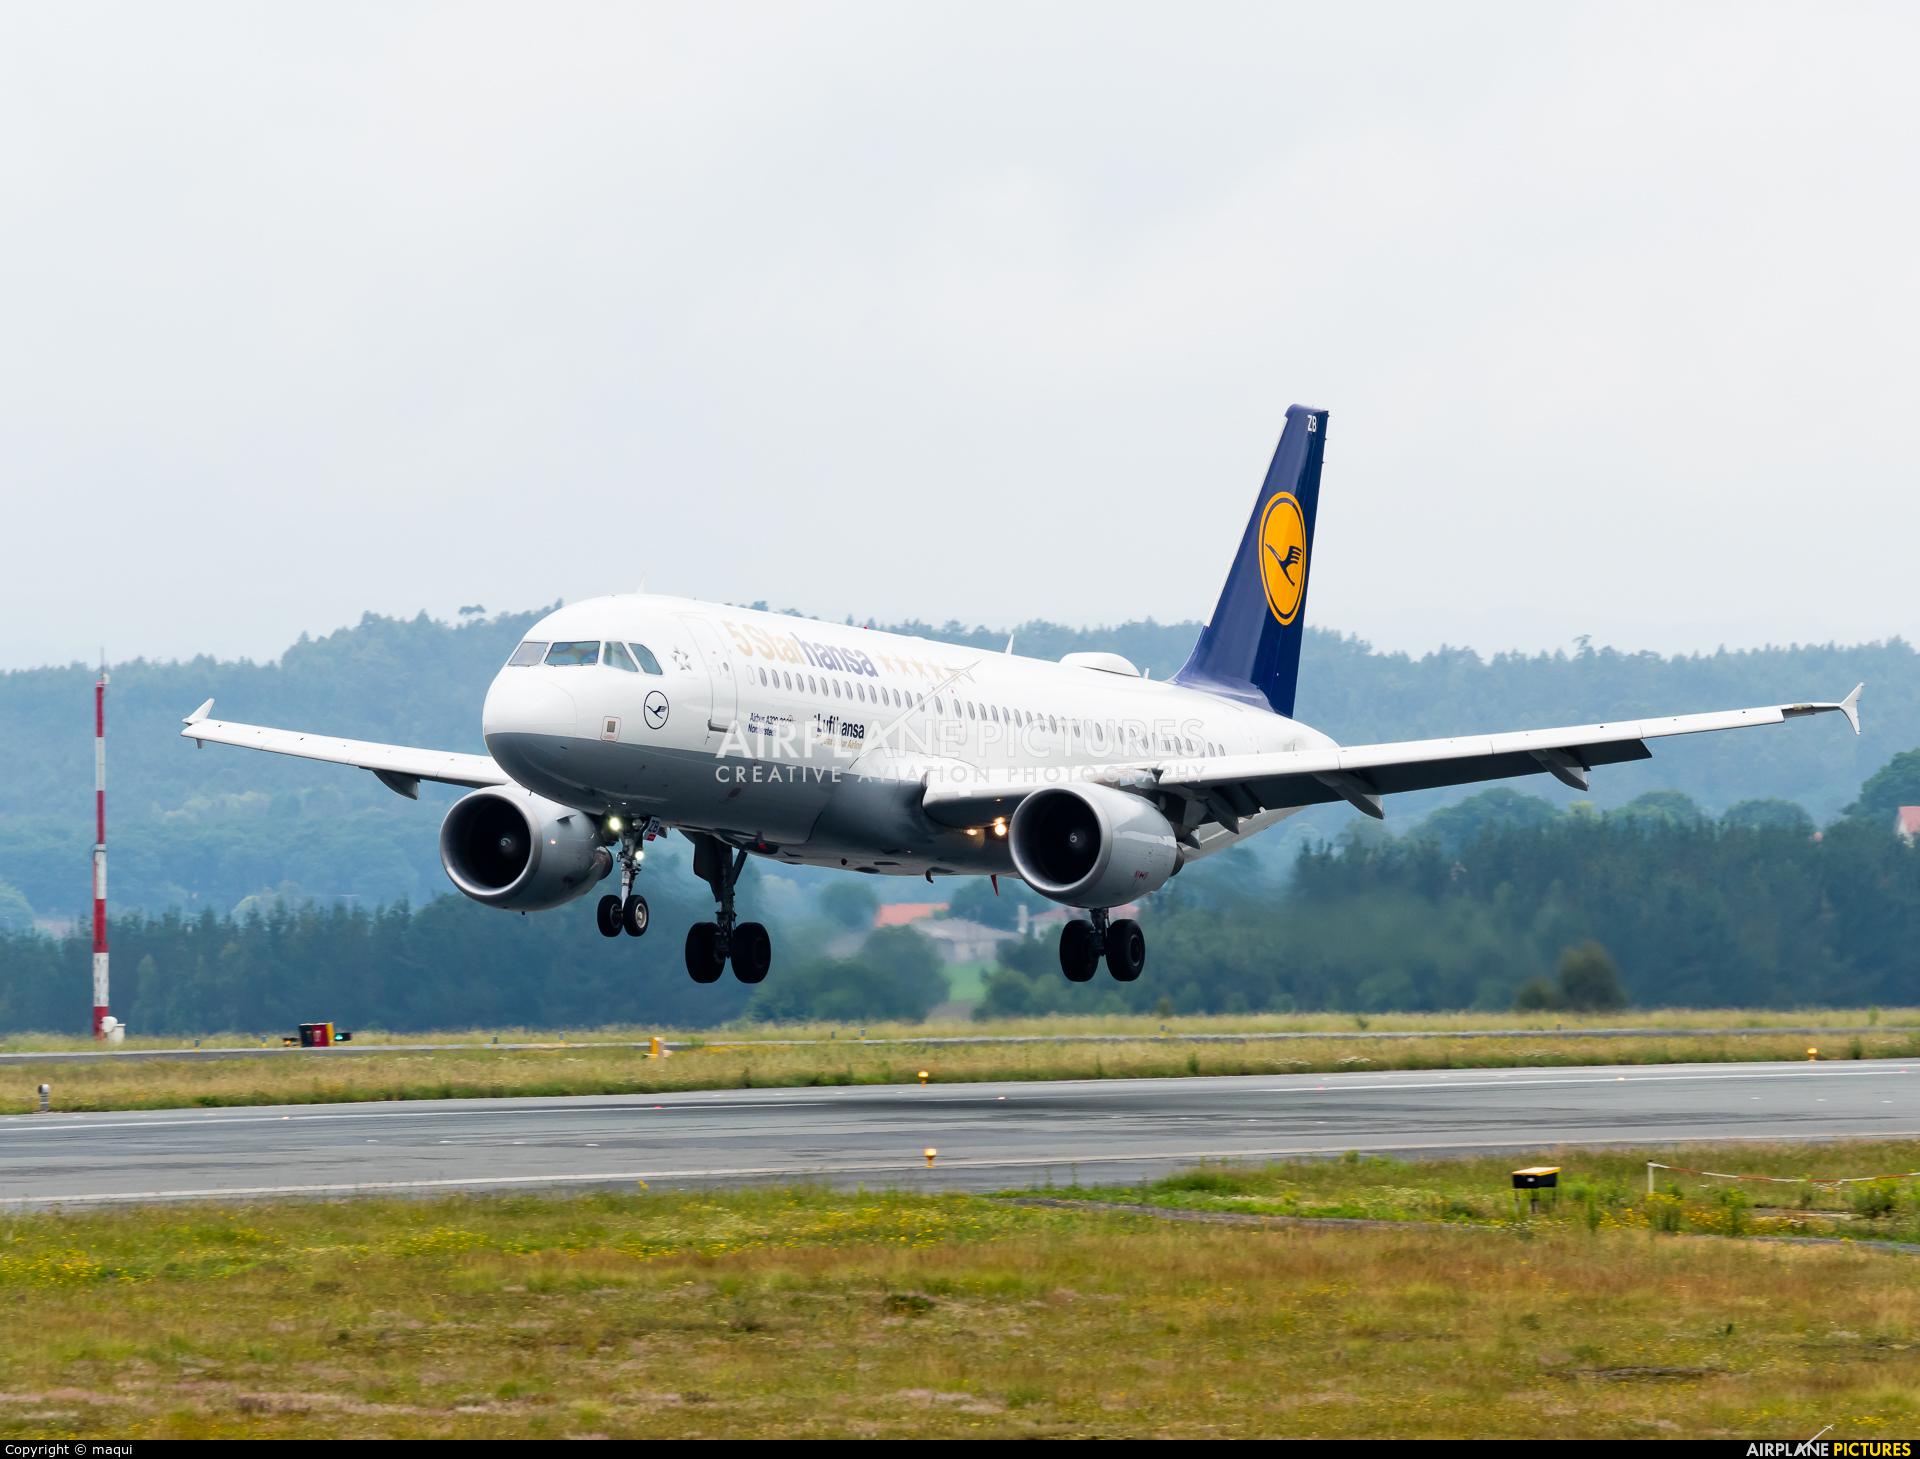 Lufthansa D-AIZB aircraft at Santiago de Compostela